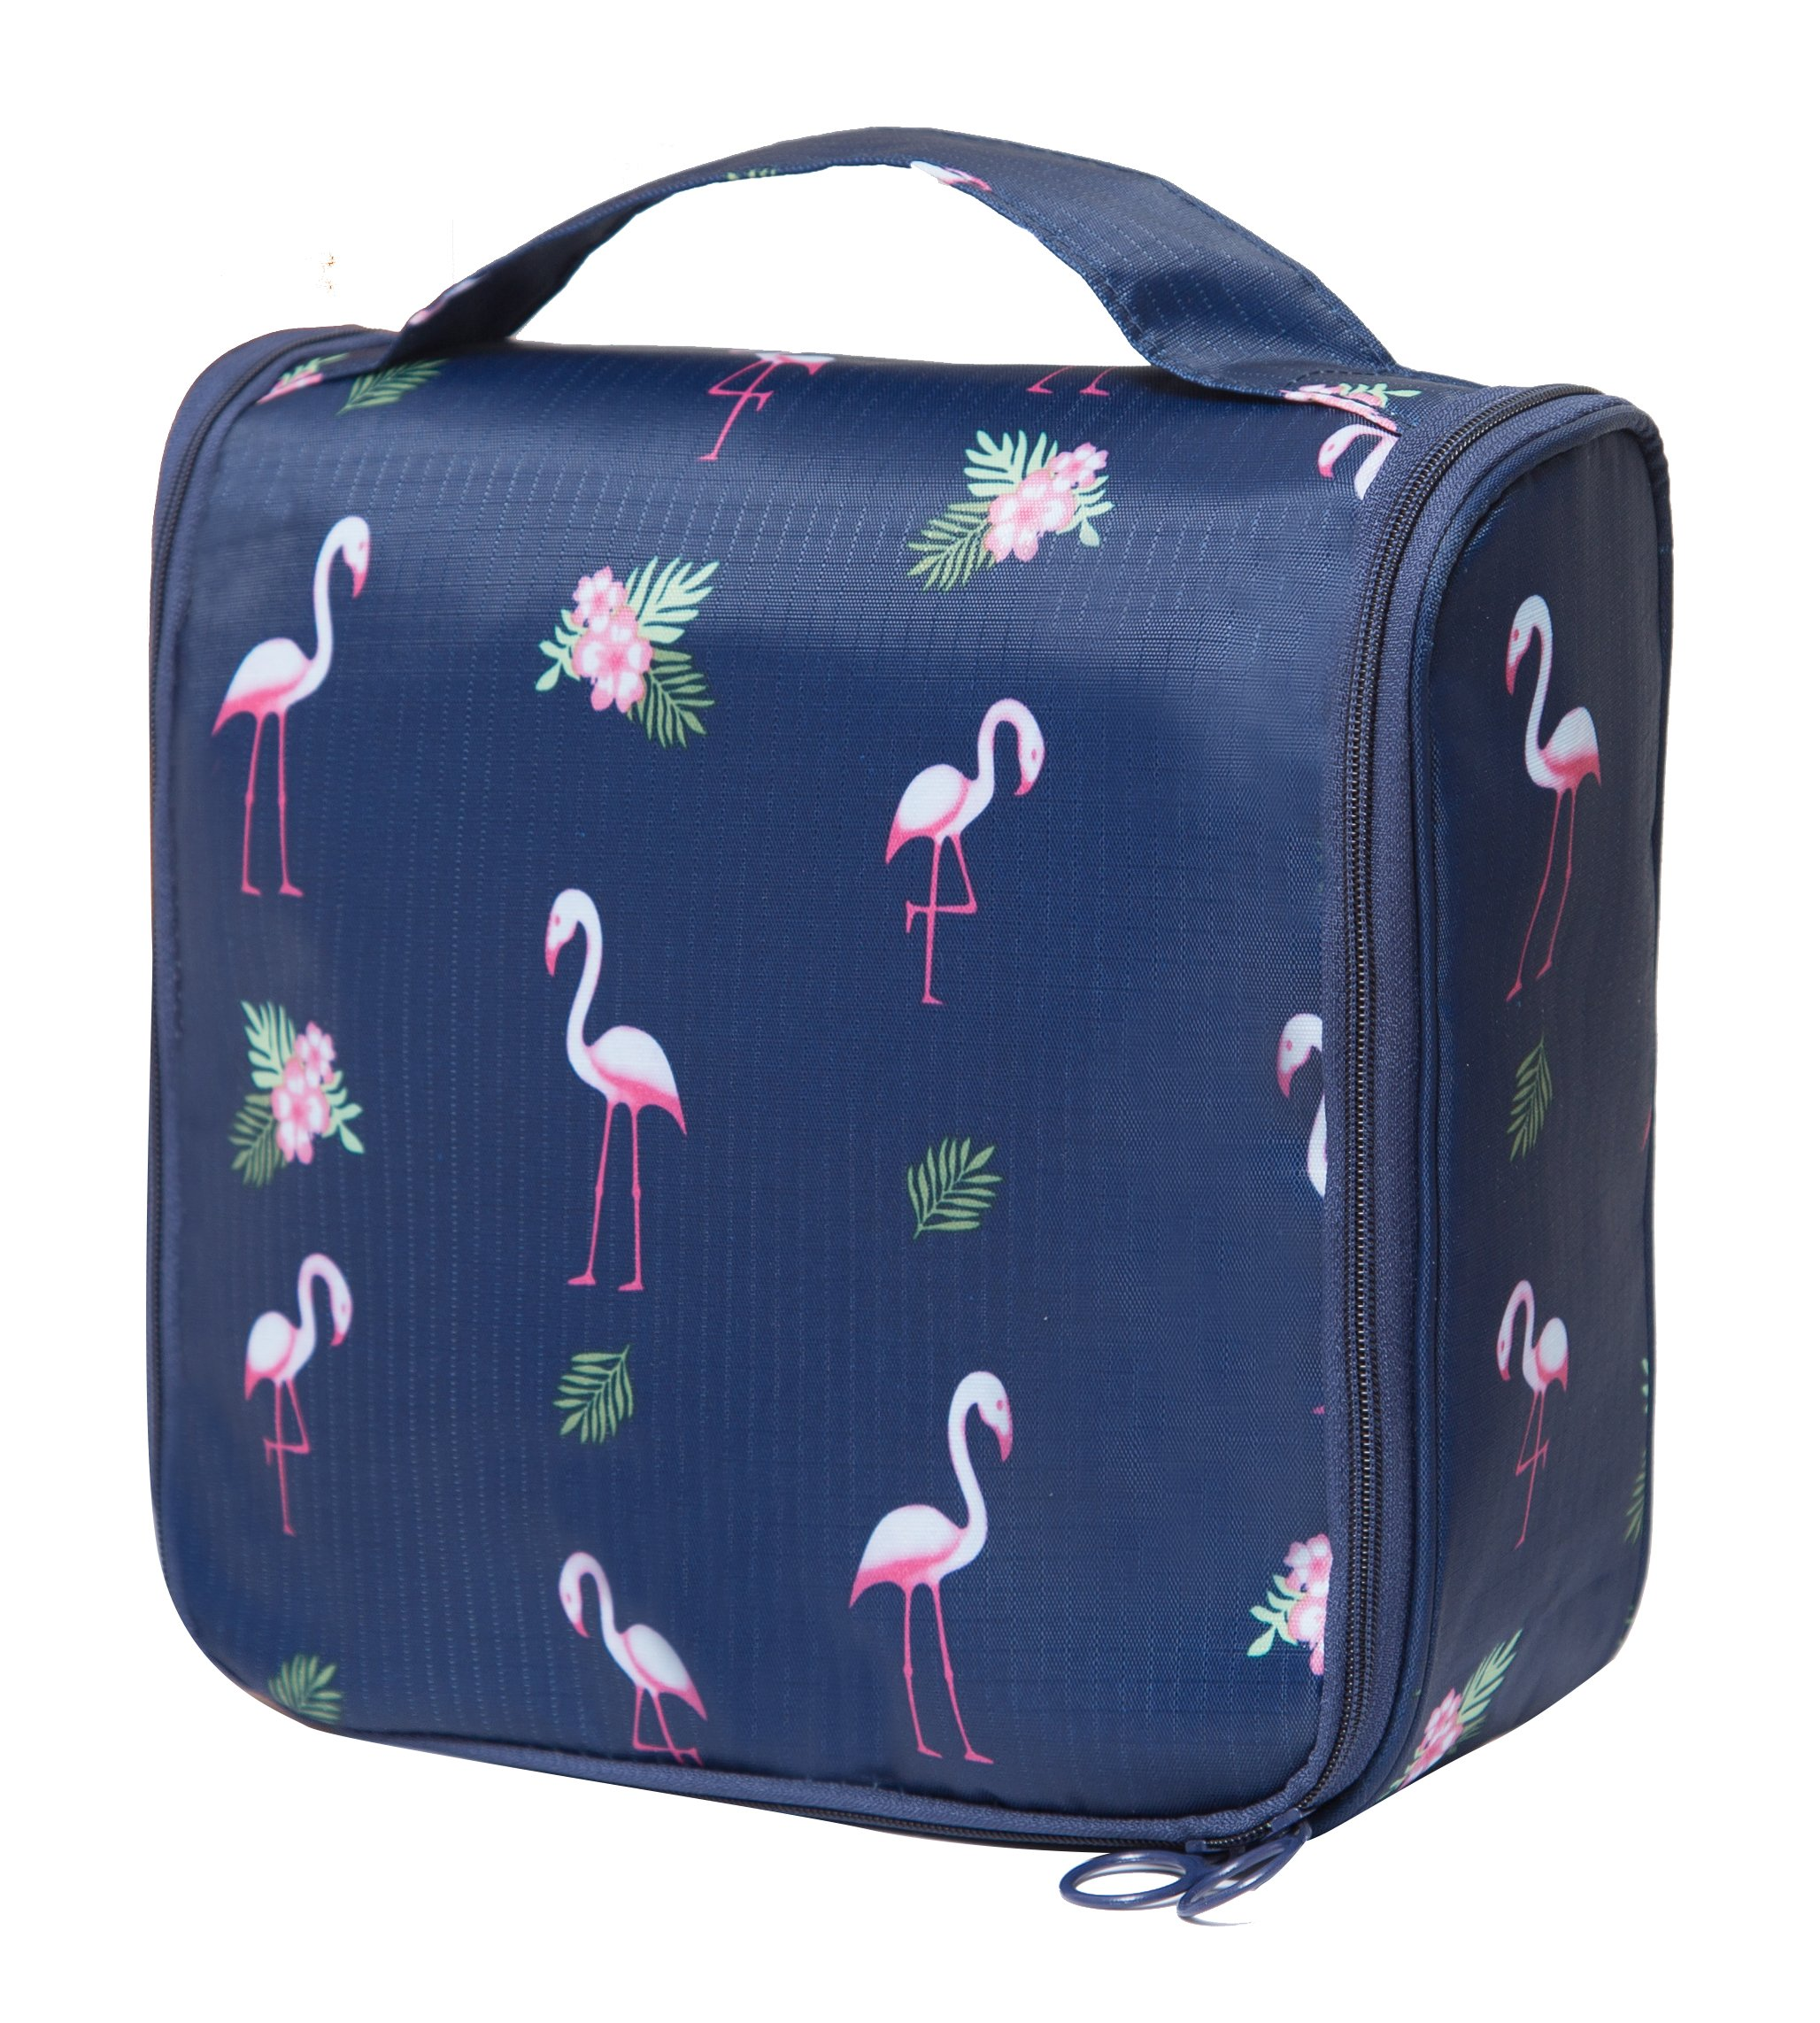 Portable Hanging Travel Toiletry Bag Waterproof Makeup Organizer Cosmetic Bag Pouch For Women Girl (Flamingo)